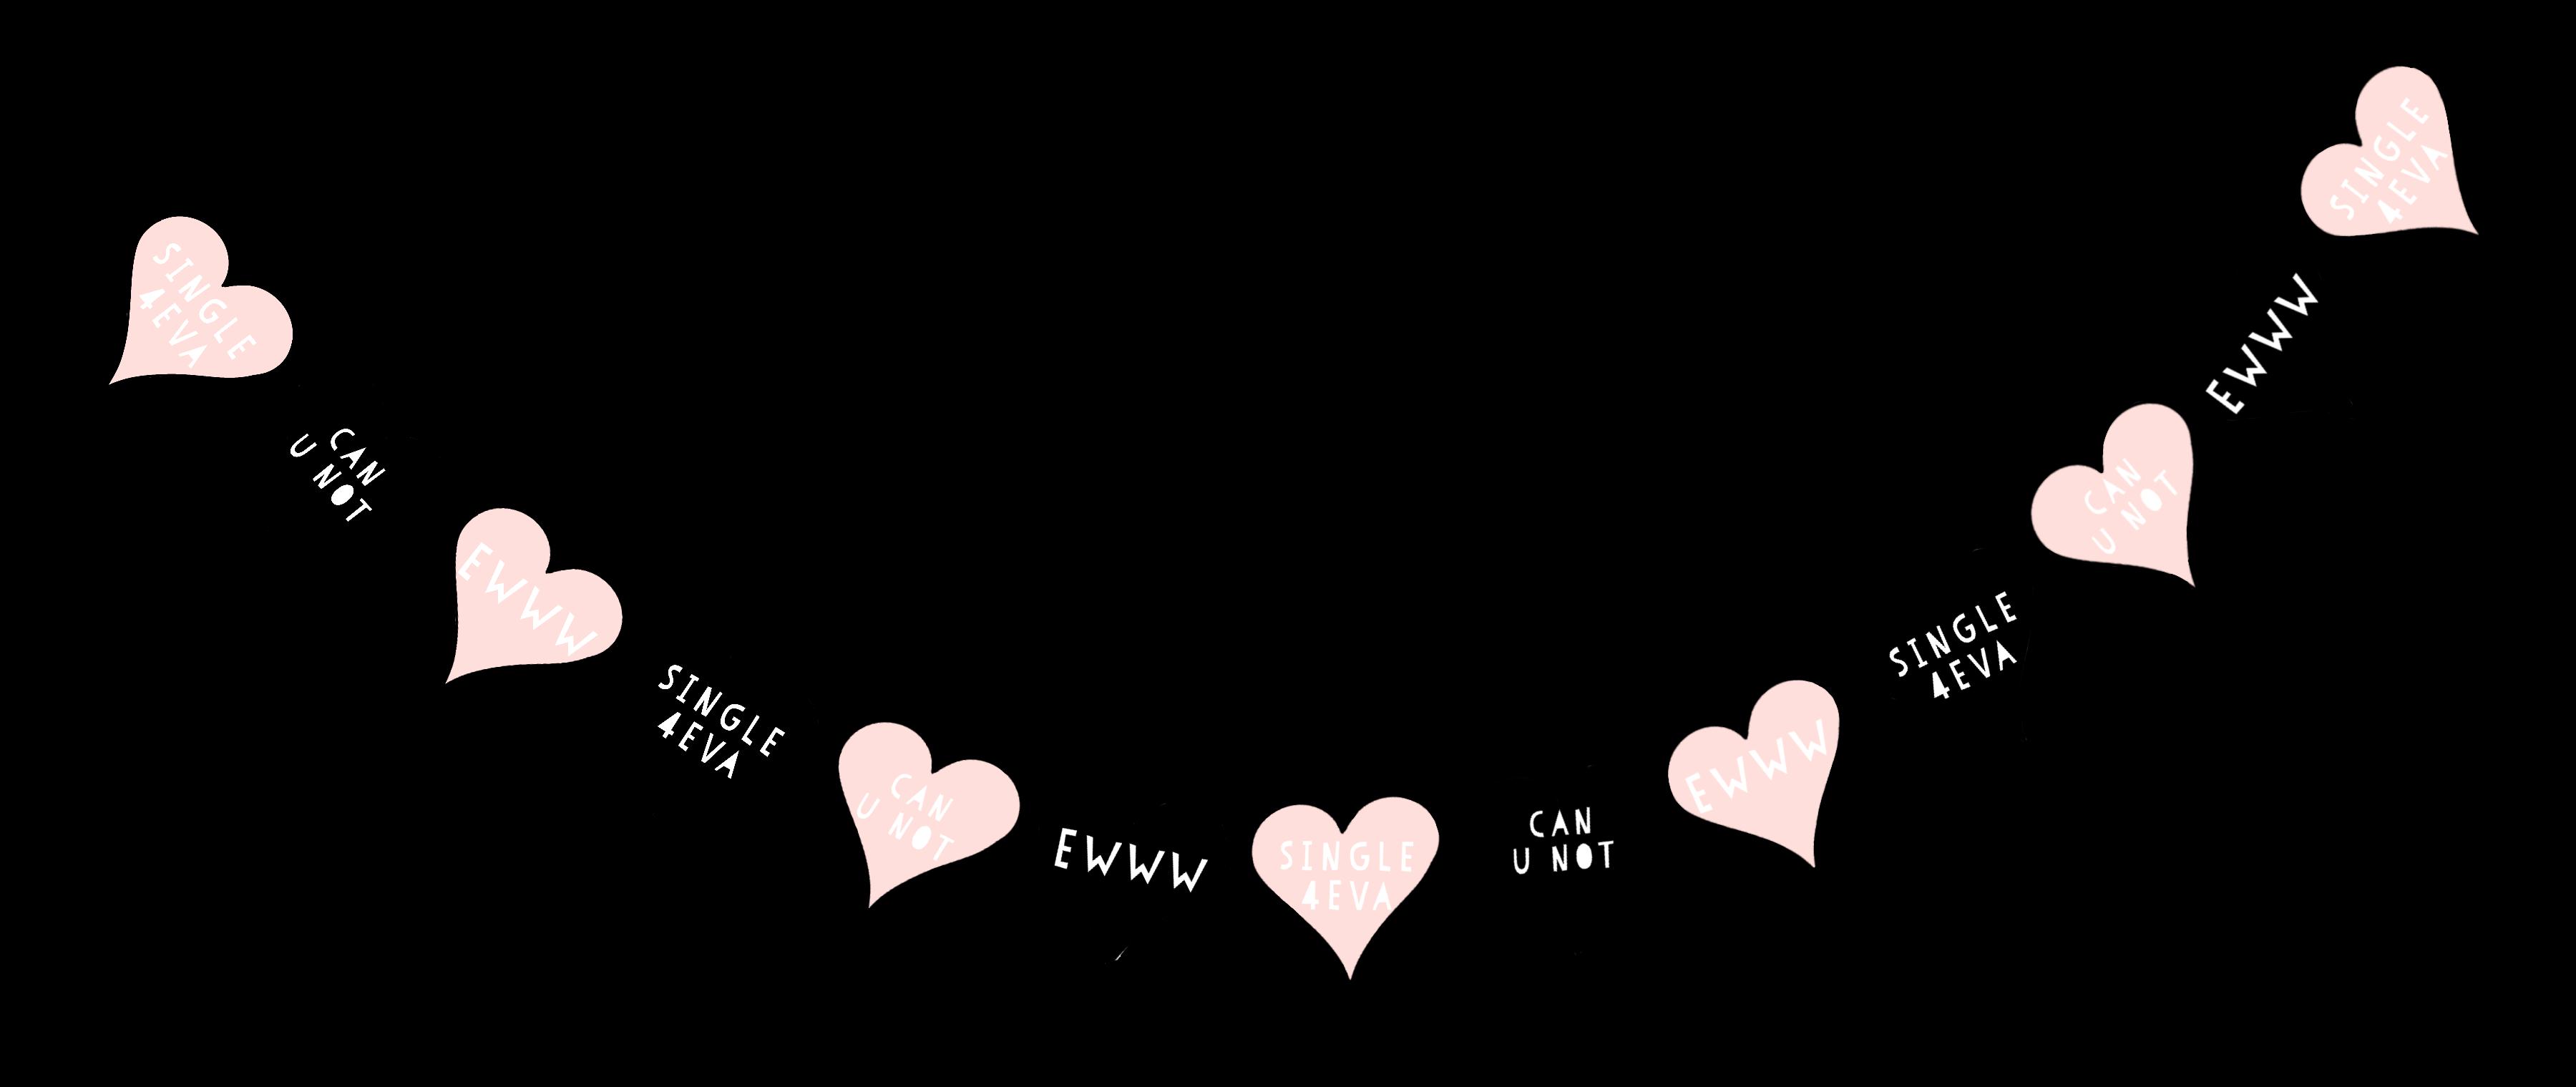 Popminis Sassy Hearts - Heart , Transparent Cartoon - Jing.fm